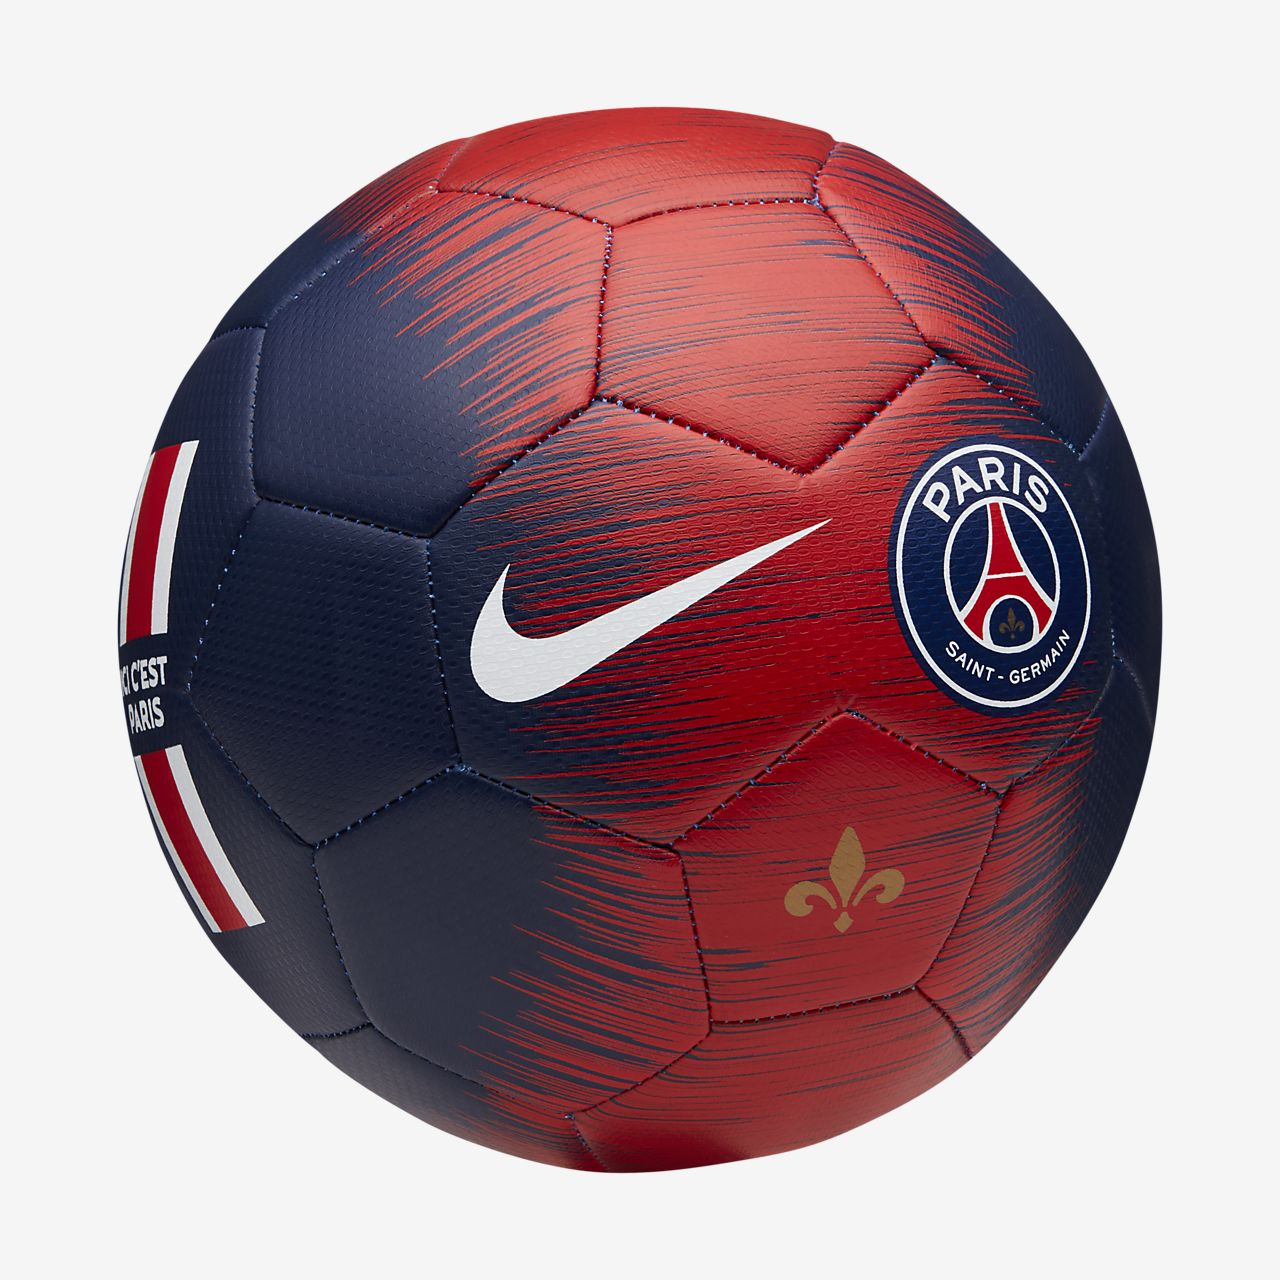 Balón de fútbol Paris Saint-Germain Prestige. Nike.com CL fd50fbb656e05